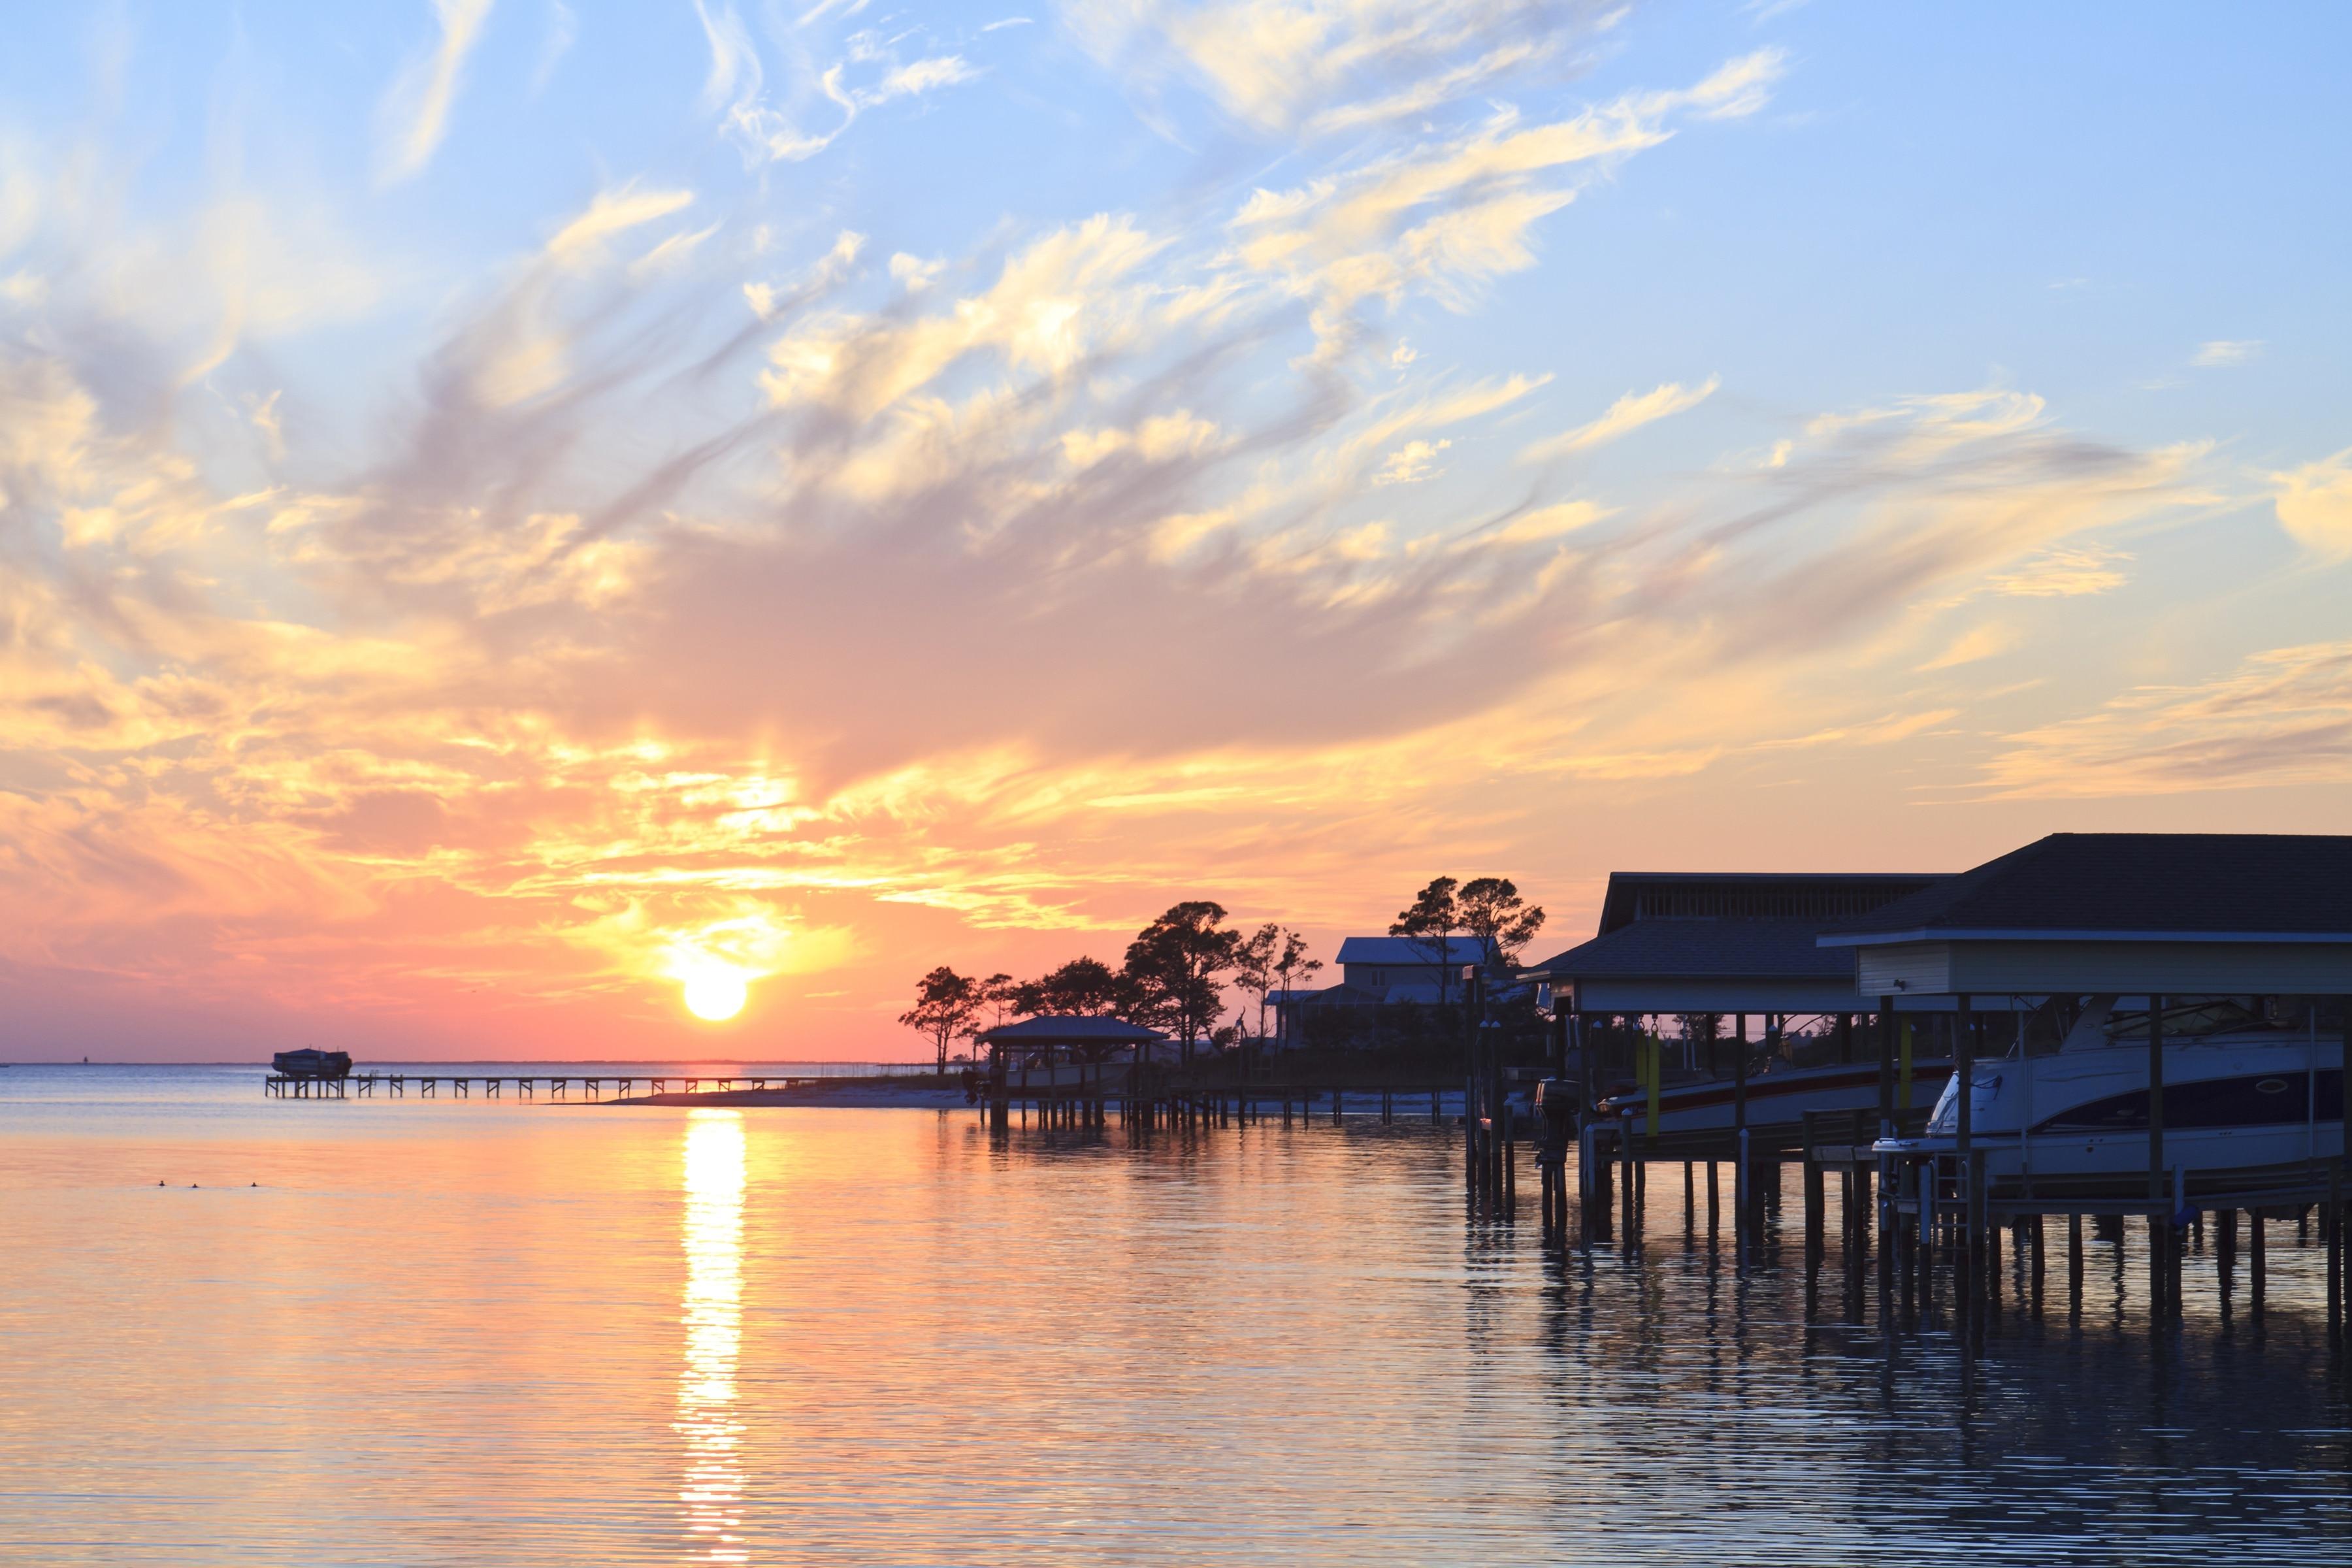 Gulf Breeze, Florida, United States of America